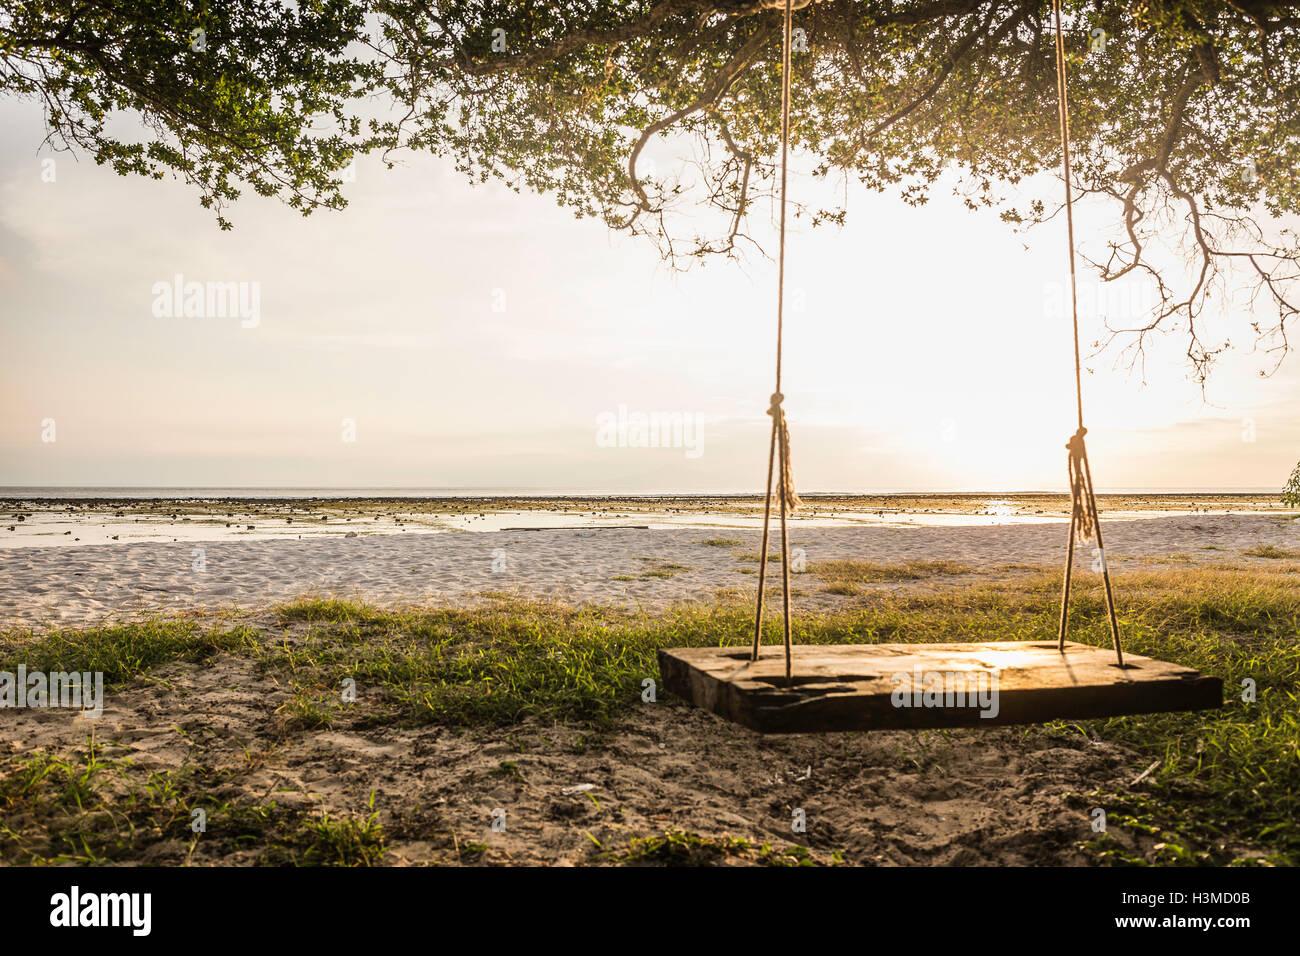 Empty beach tree swing at sunset, Gili Trawangan, Lombok, Indonesia - Stock Image